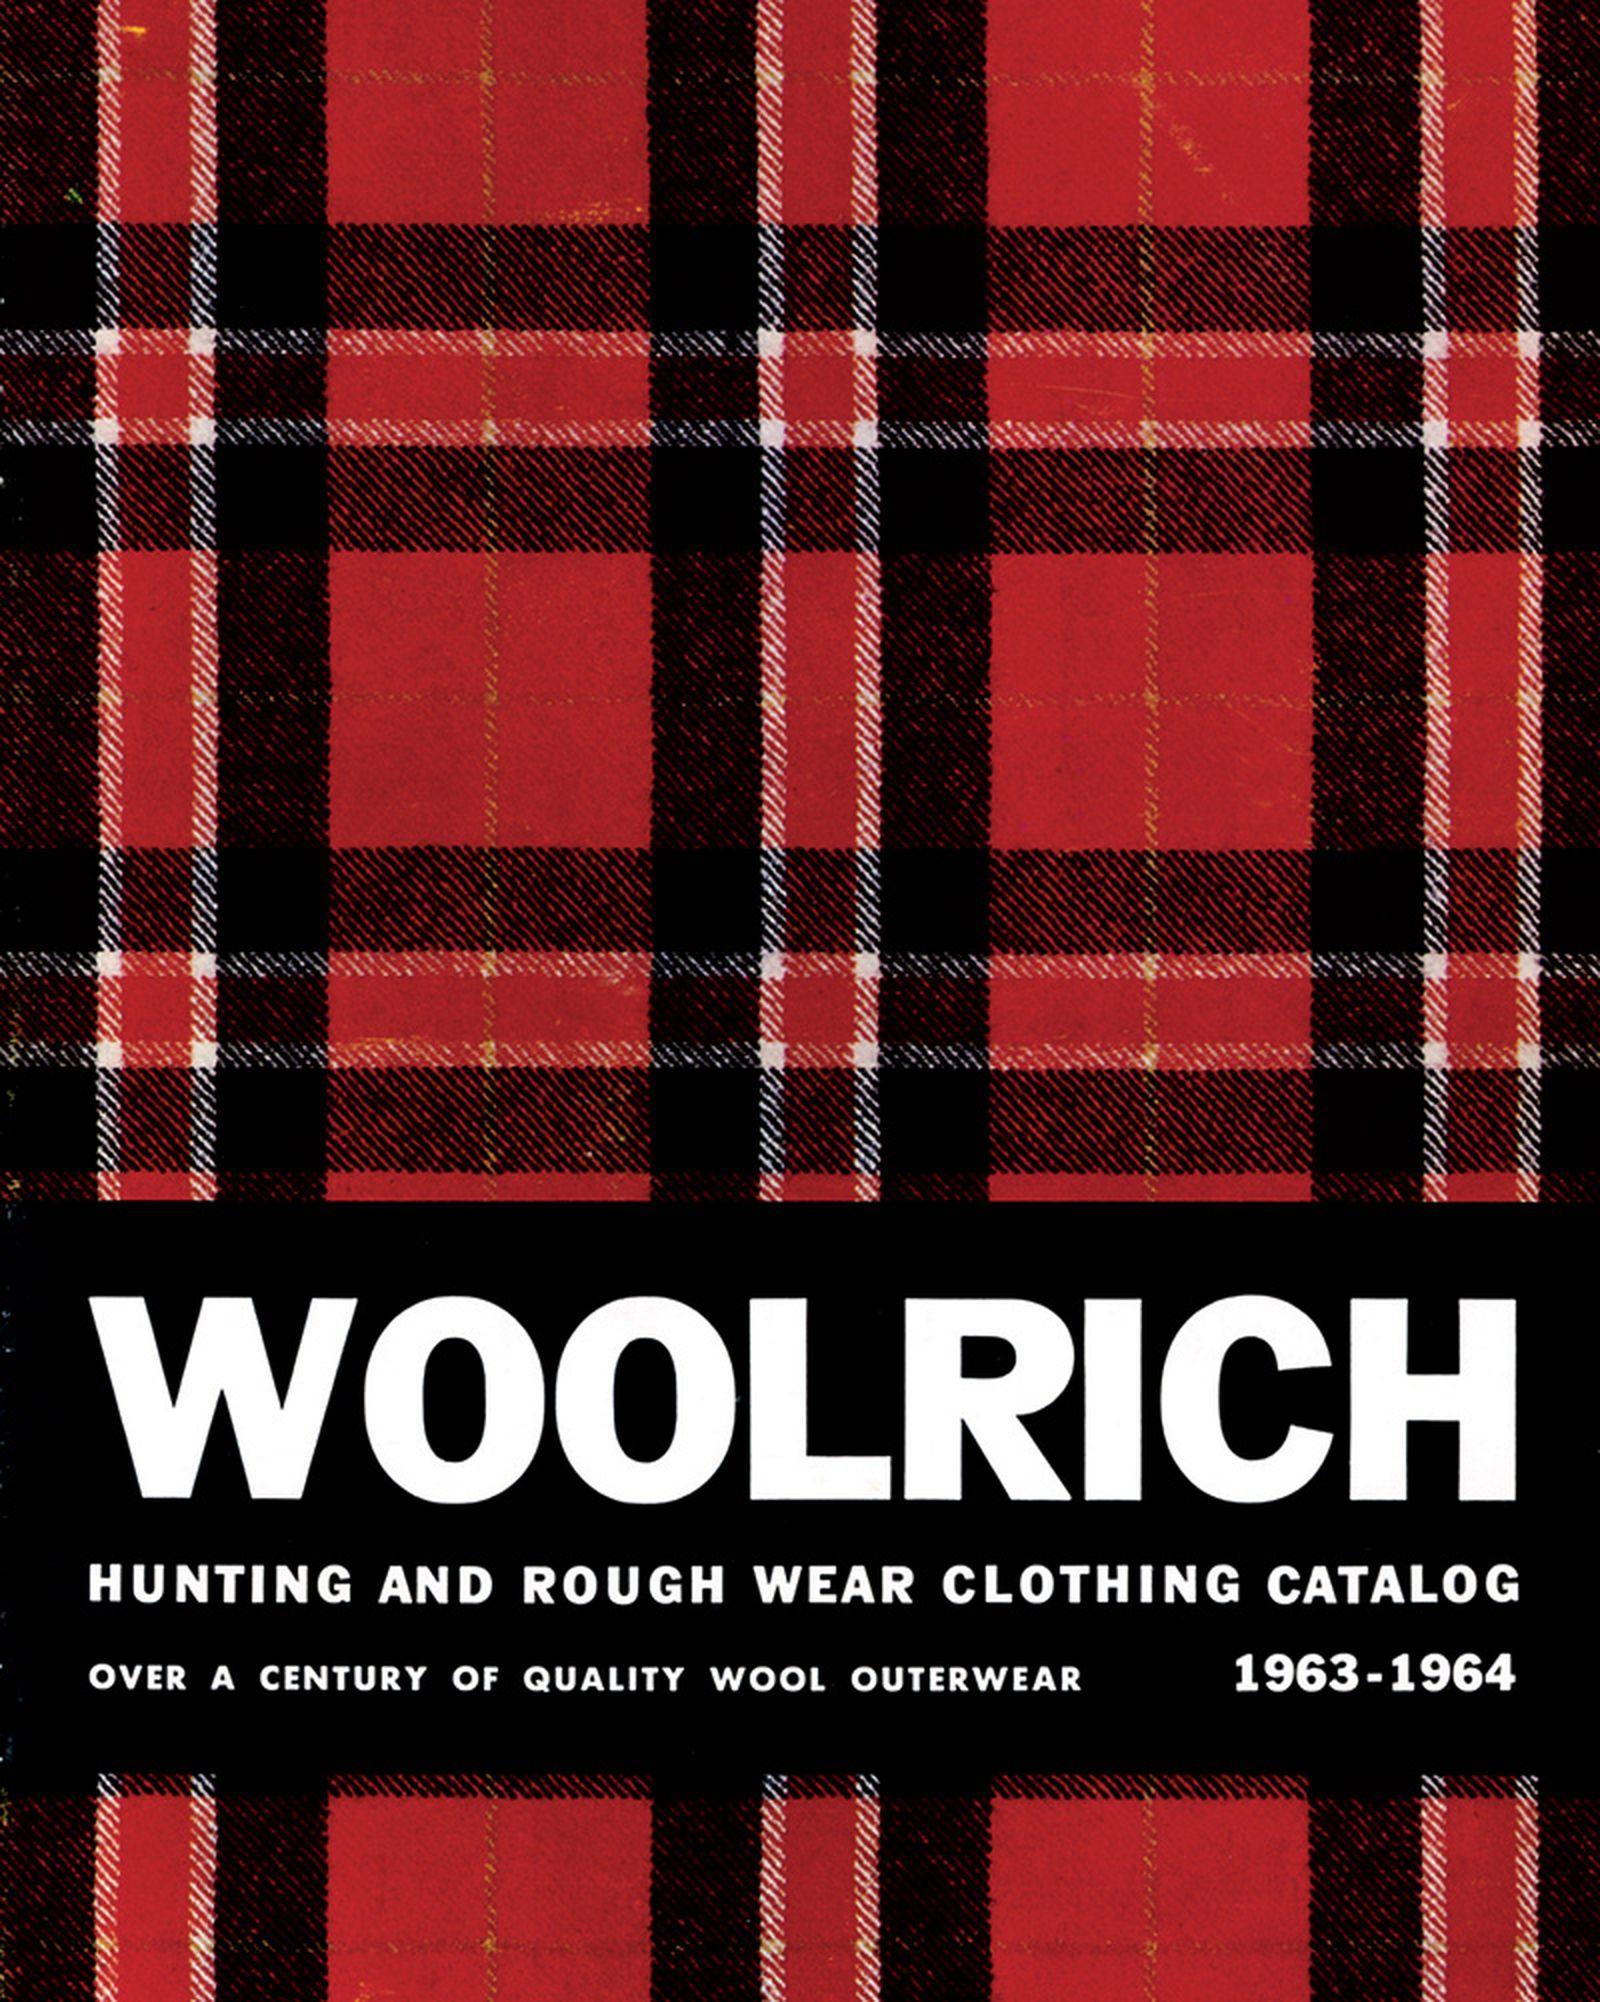 woolrich-flannel-buffalo-check-plaid-05